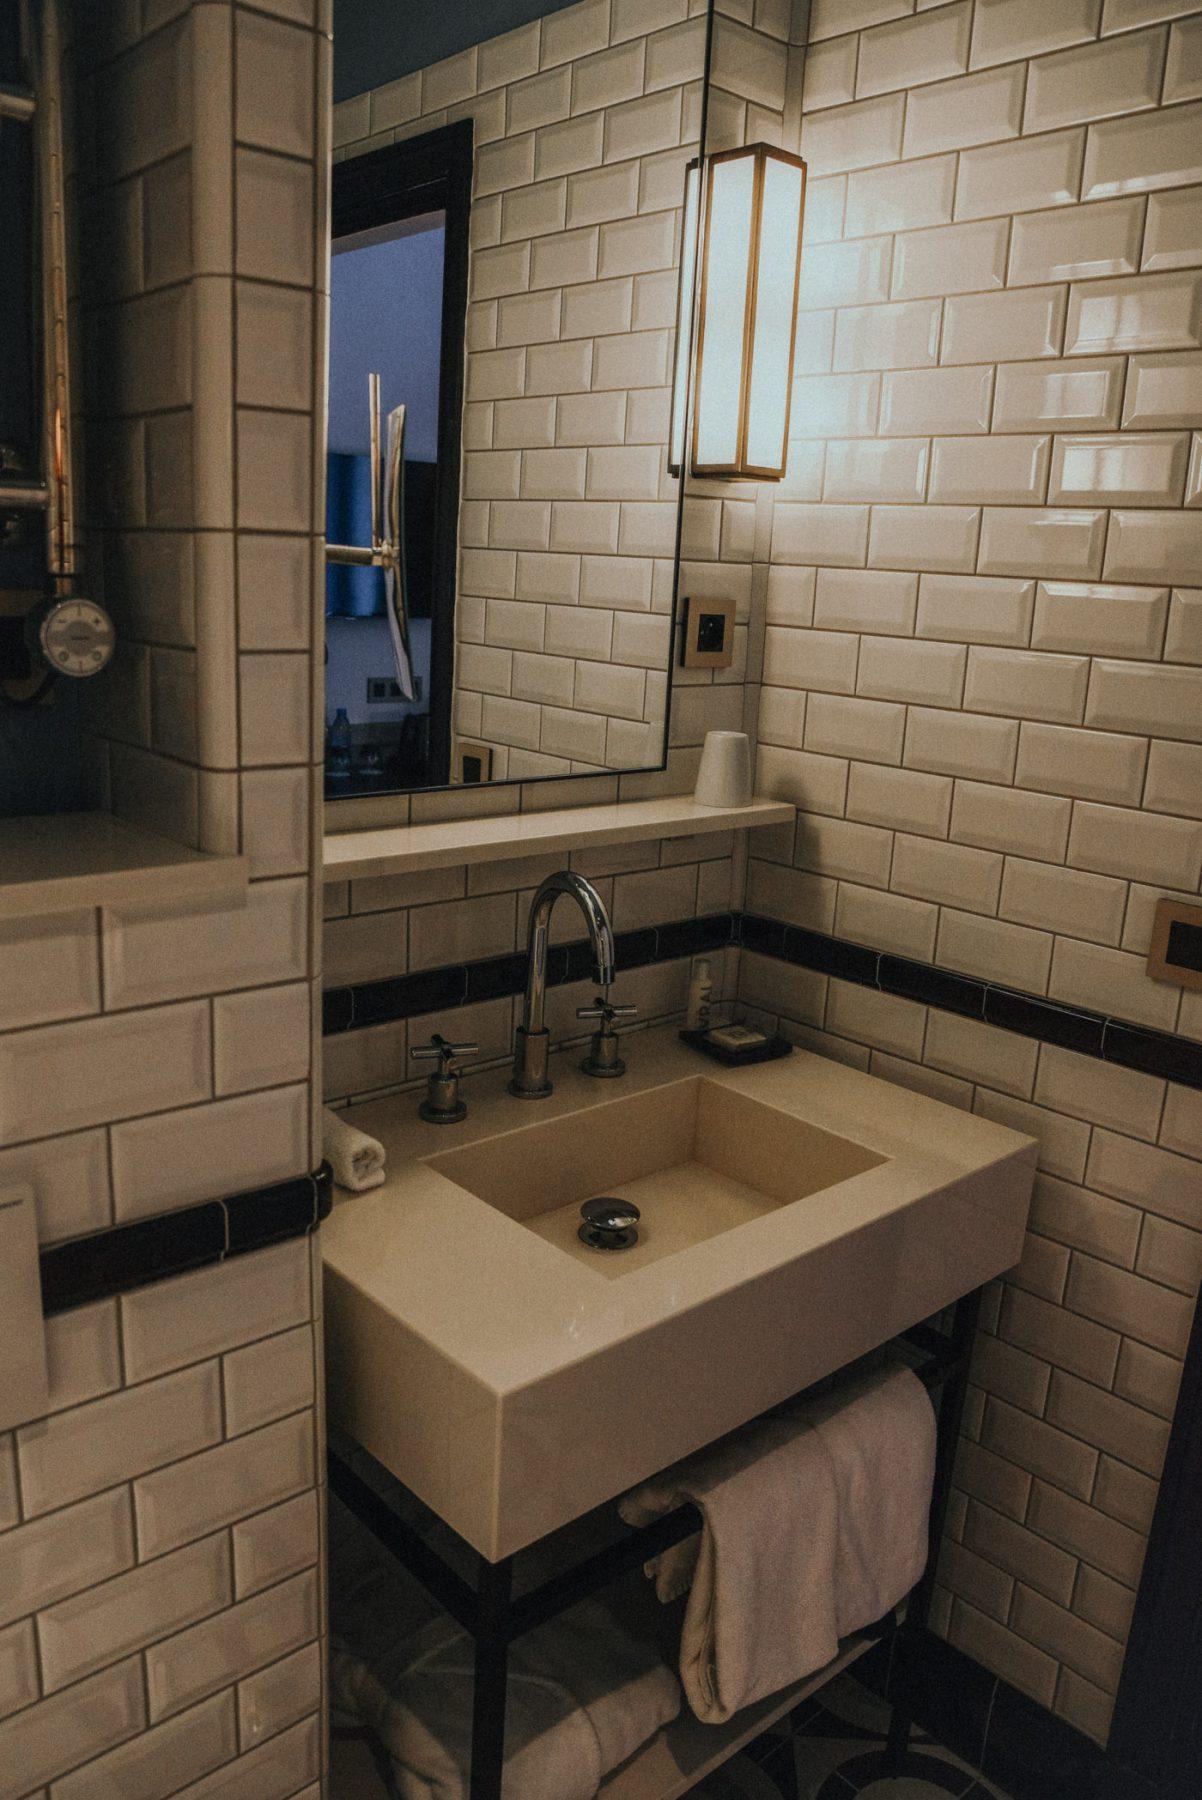 hotelreview-adele-jules-paris-boutique-hotel-zentrum-fashionblog-travelblog-reiseblog-fashionzauber-badezimmer